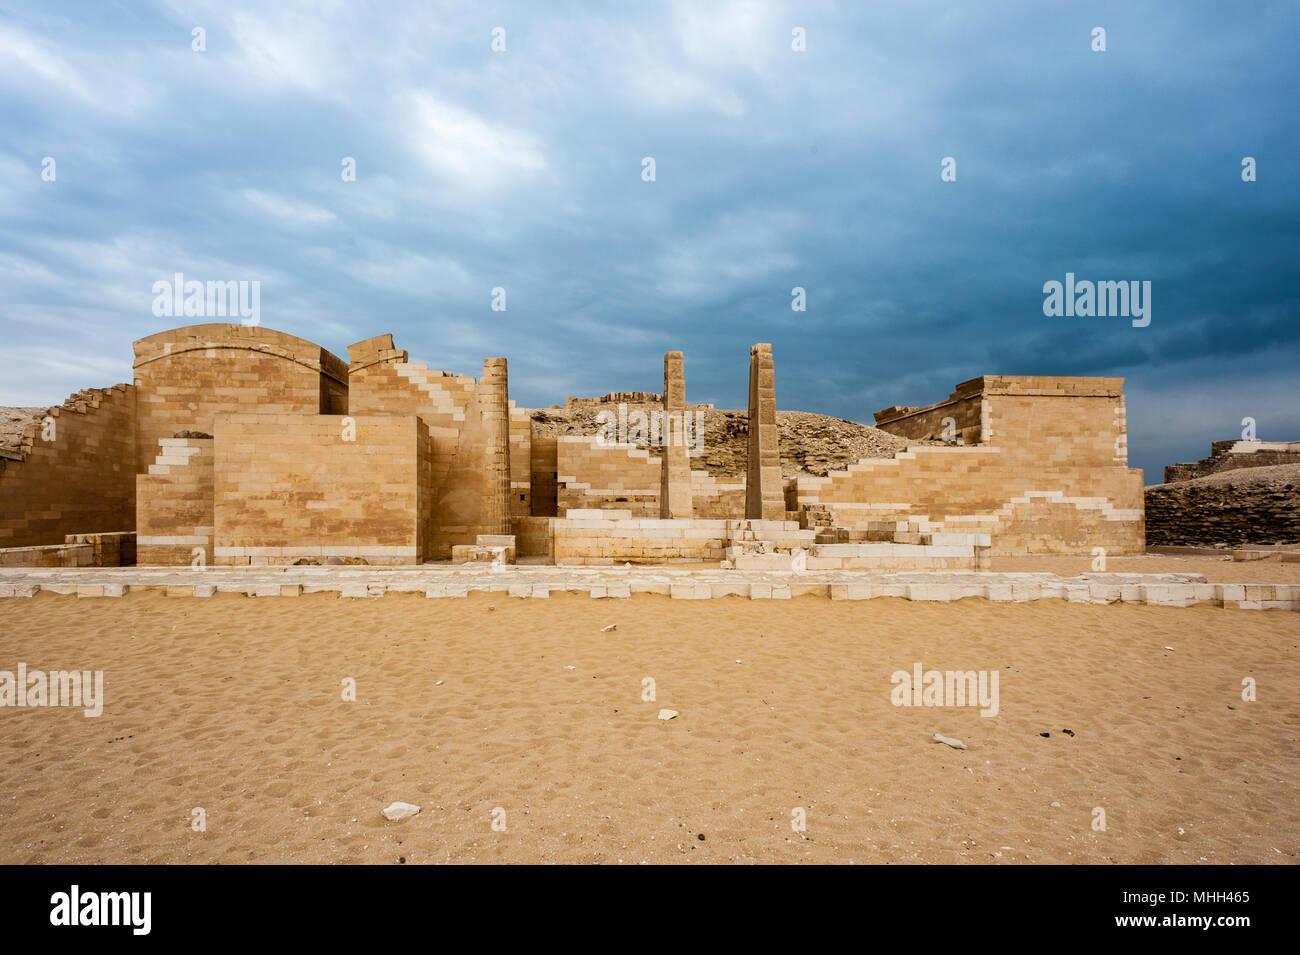 Ruins of the Saqqara necropolis, Egypt. UNESCO World Heritage - Stock Image